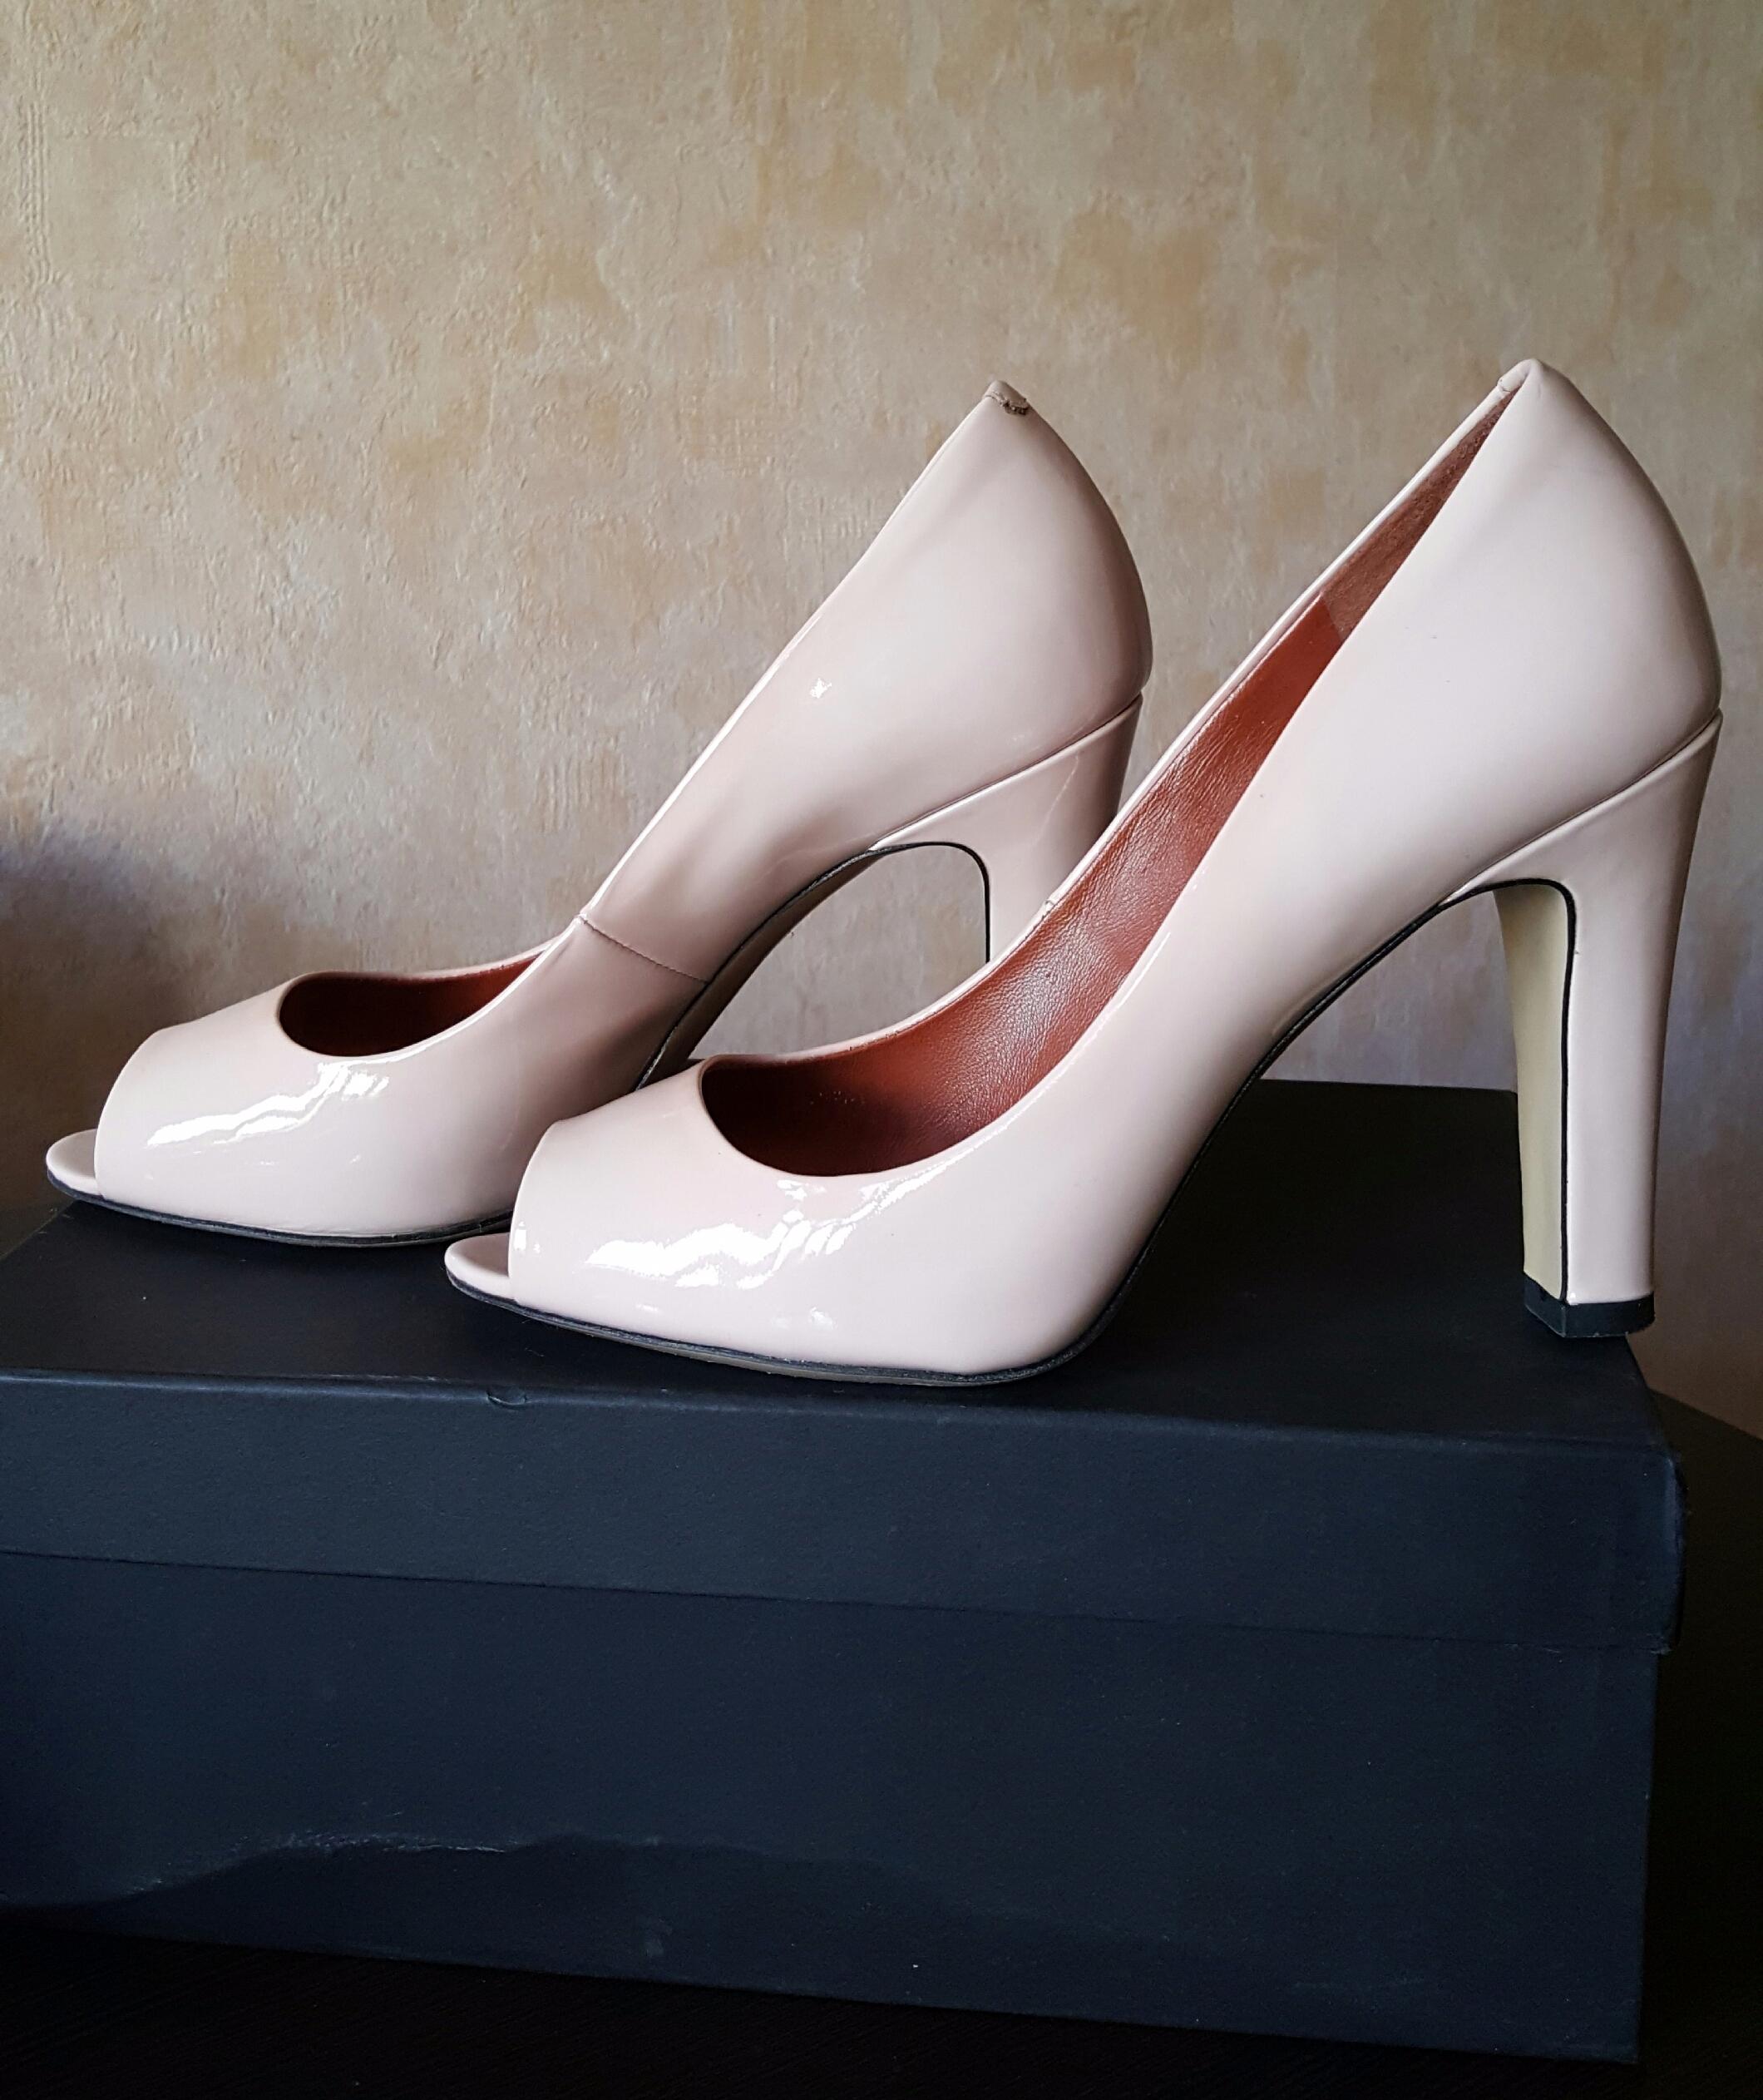 Купить туфли Marc by Marc Jacobs за 10000 руб. в интернет магазине ... e8be5adbe84